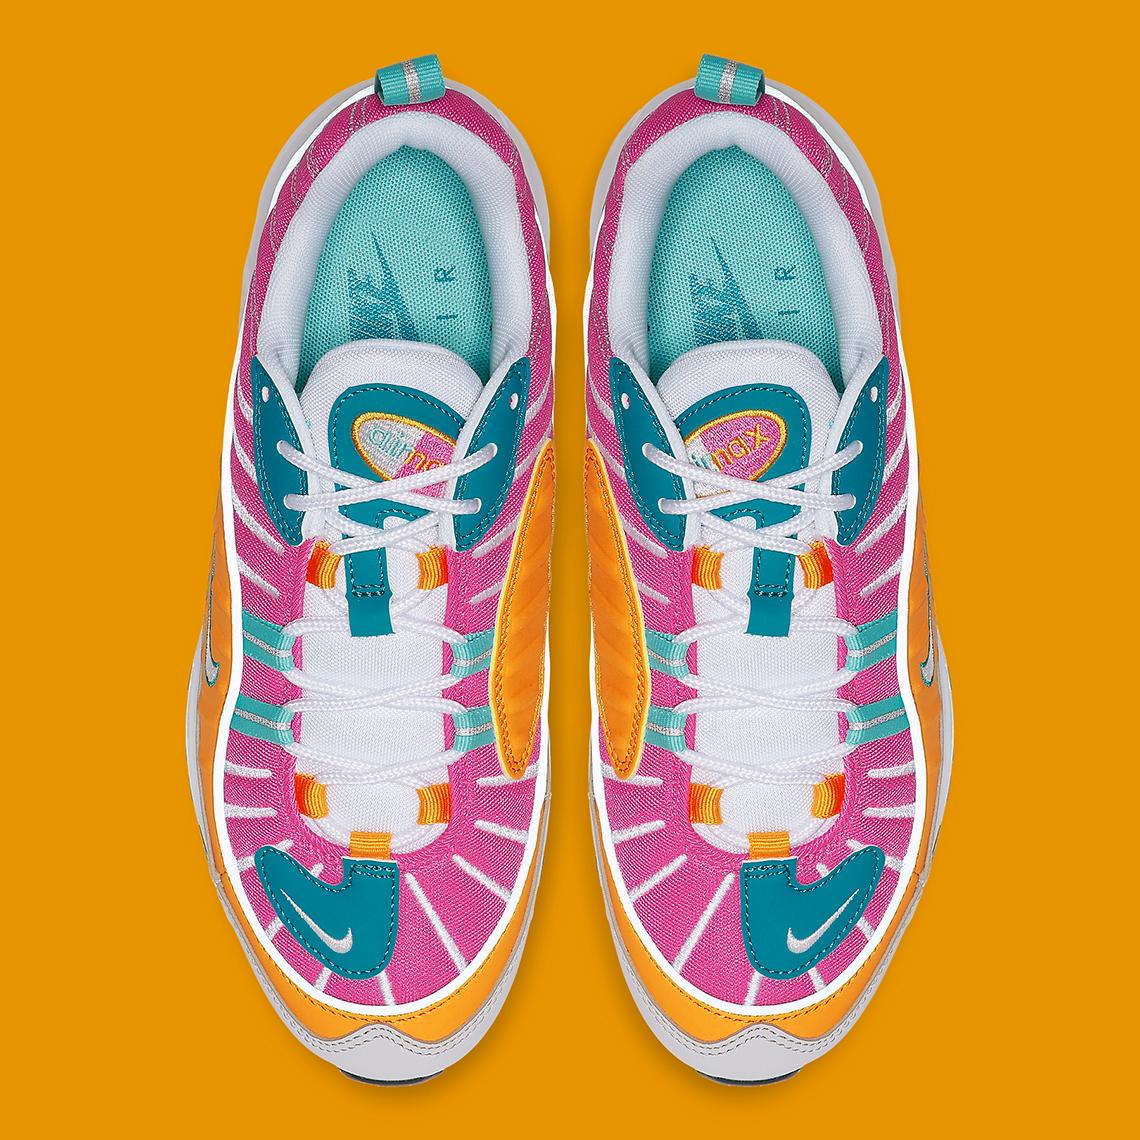 Nike Air Max 98 Easter CI9897-301 Store